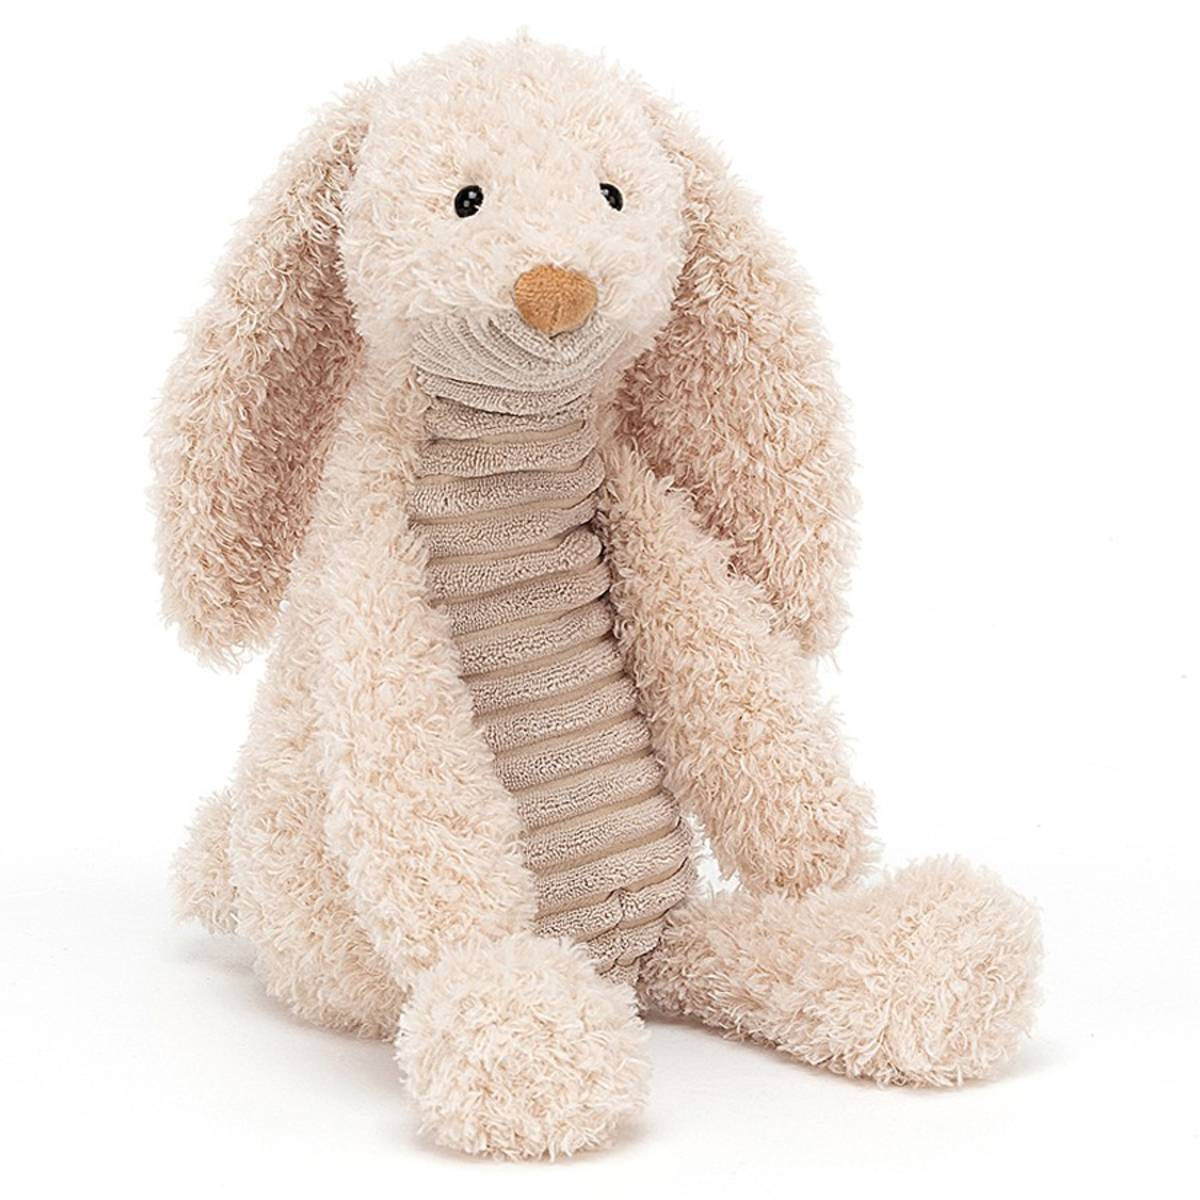 Jellycat Wurly Bunny